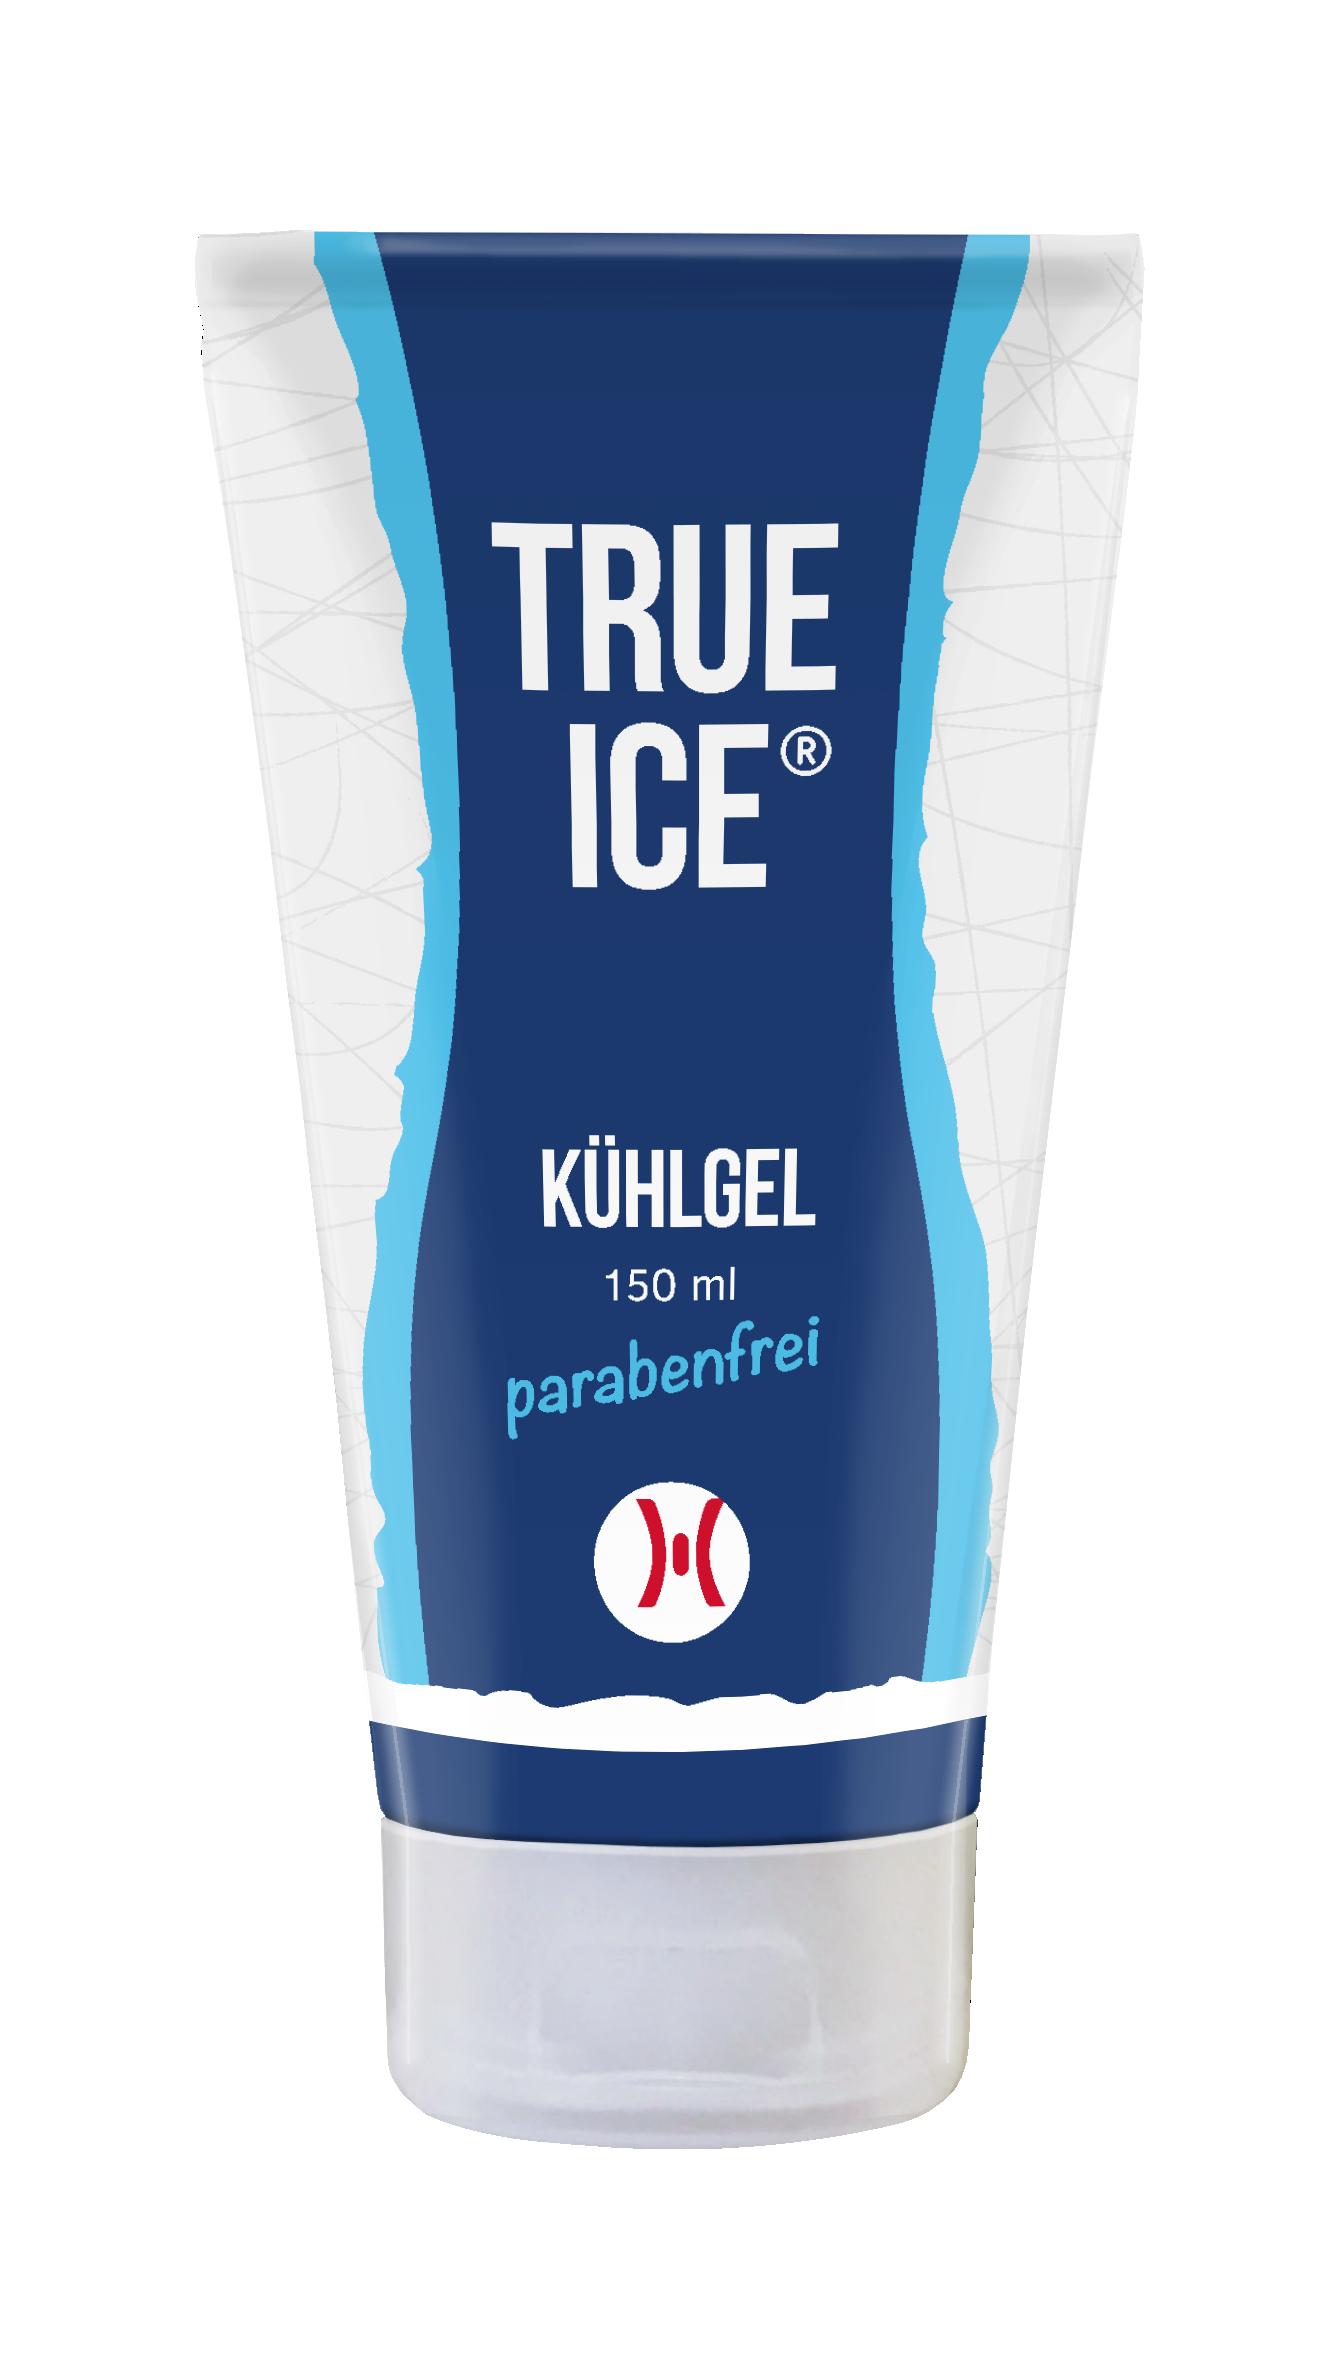 TRUE ICE®